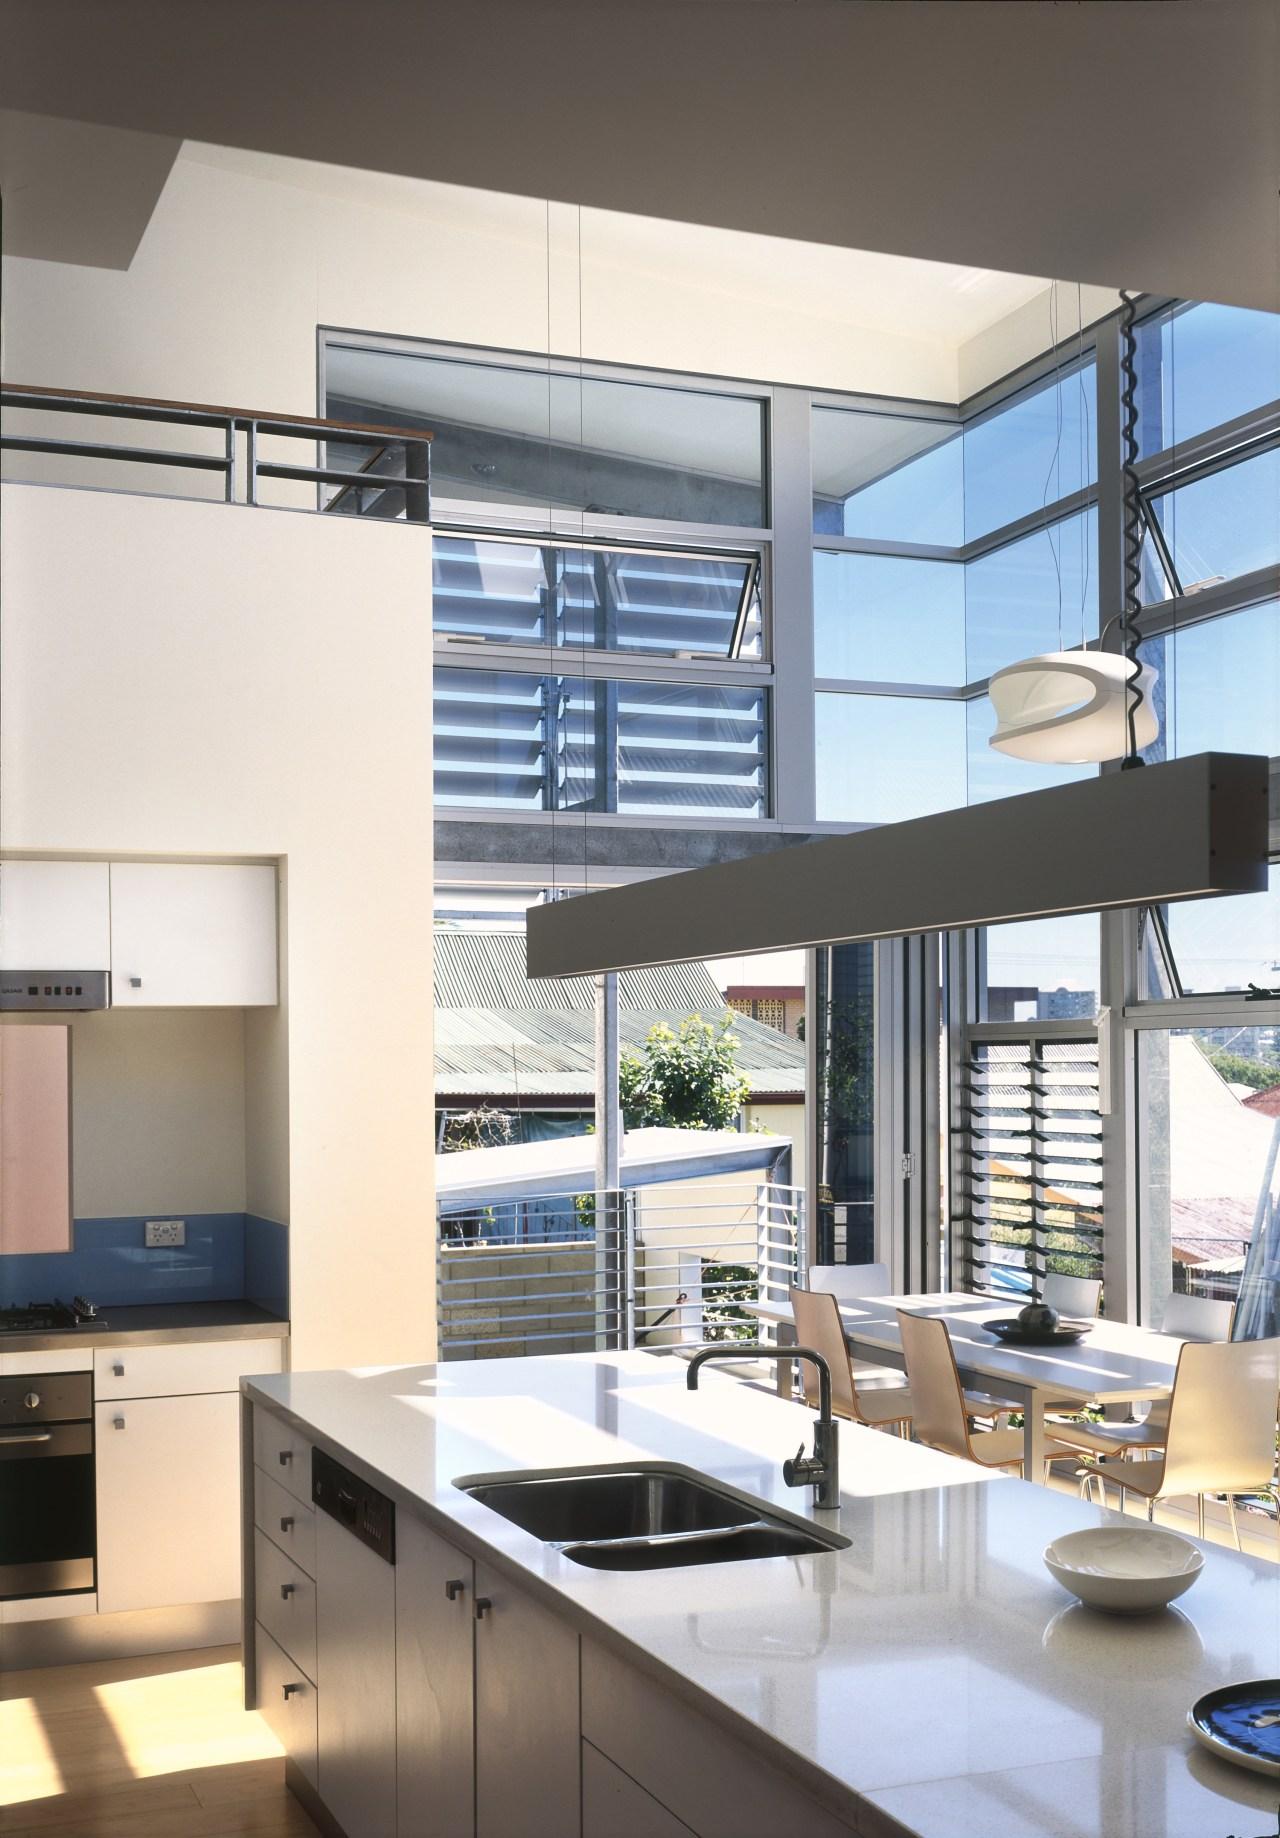 View of kitchen area a long kitchen island, countertop, daylighting, interior design, kitchen, window, white, gray